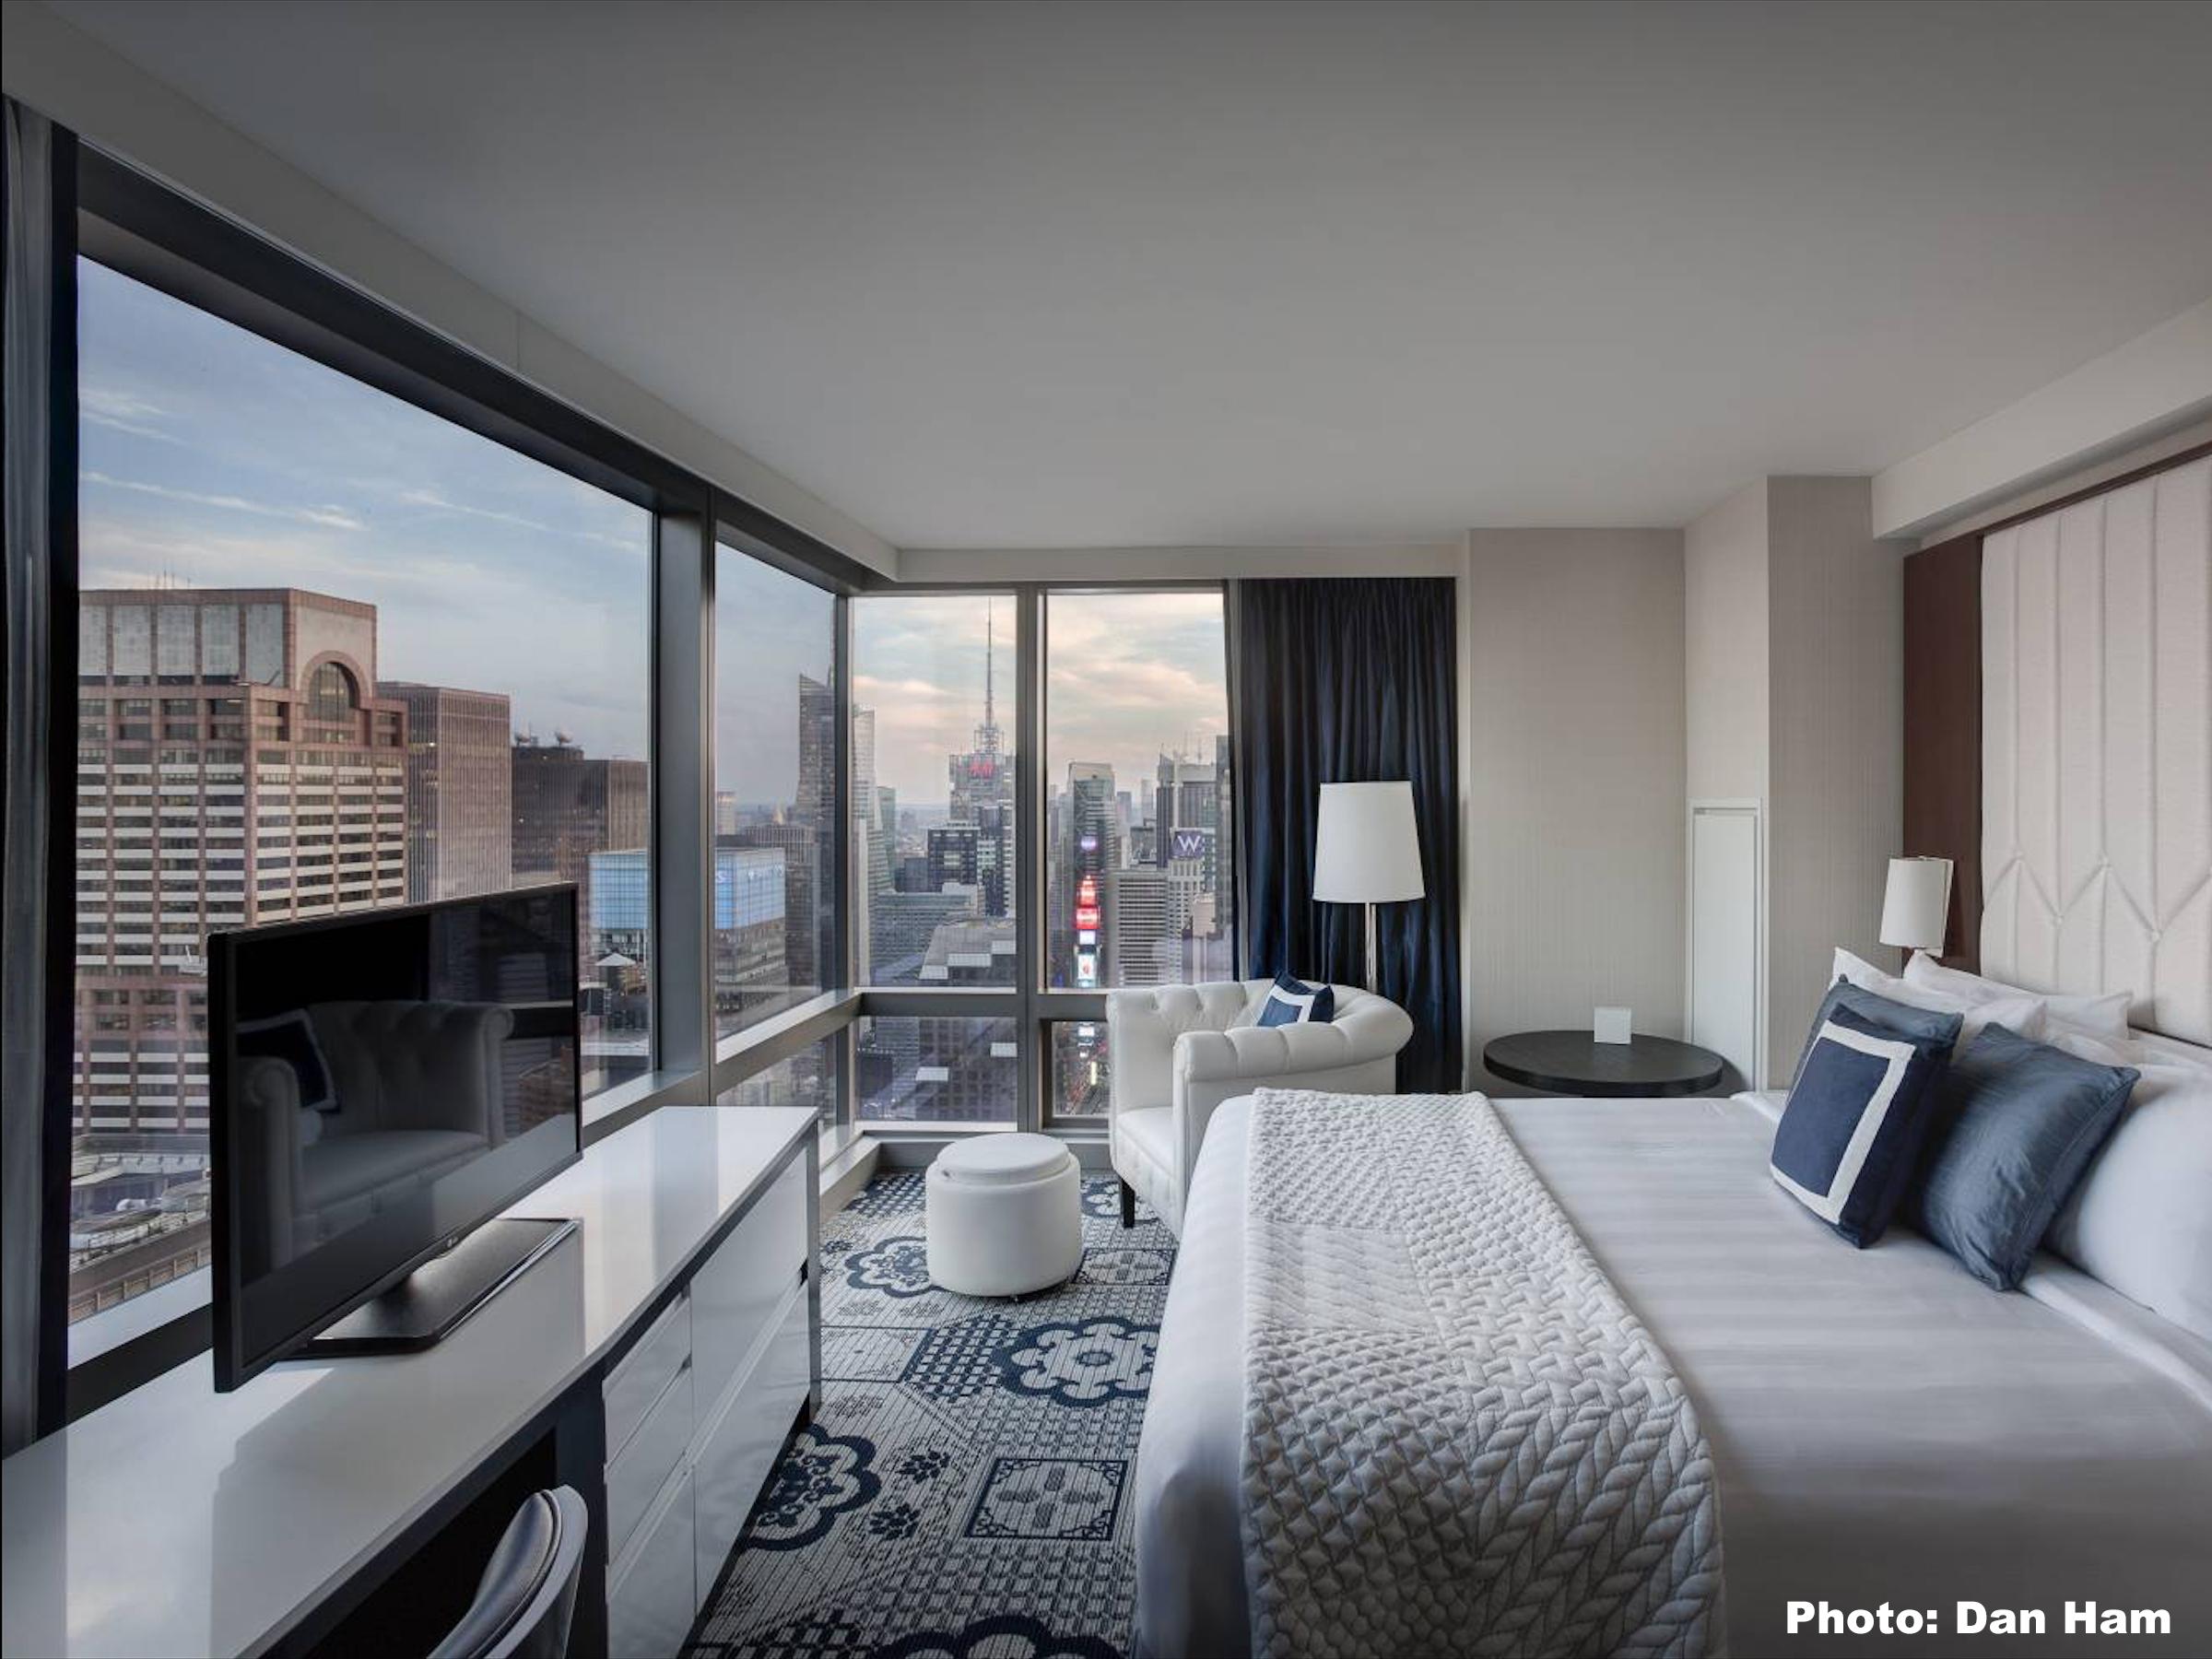 Courtyard Marriott Central Park✩✩✩✩ - Номера с видом: City ViewОт $180 за ночь(В зависимости от сезона)Район: Мидтаун